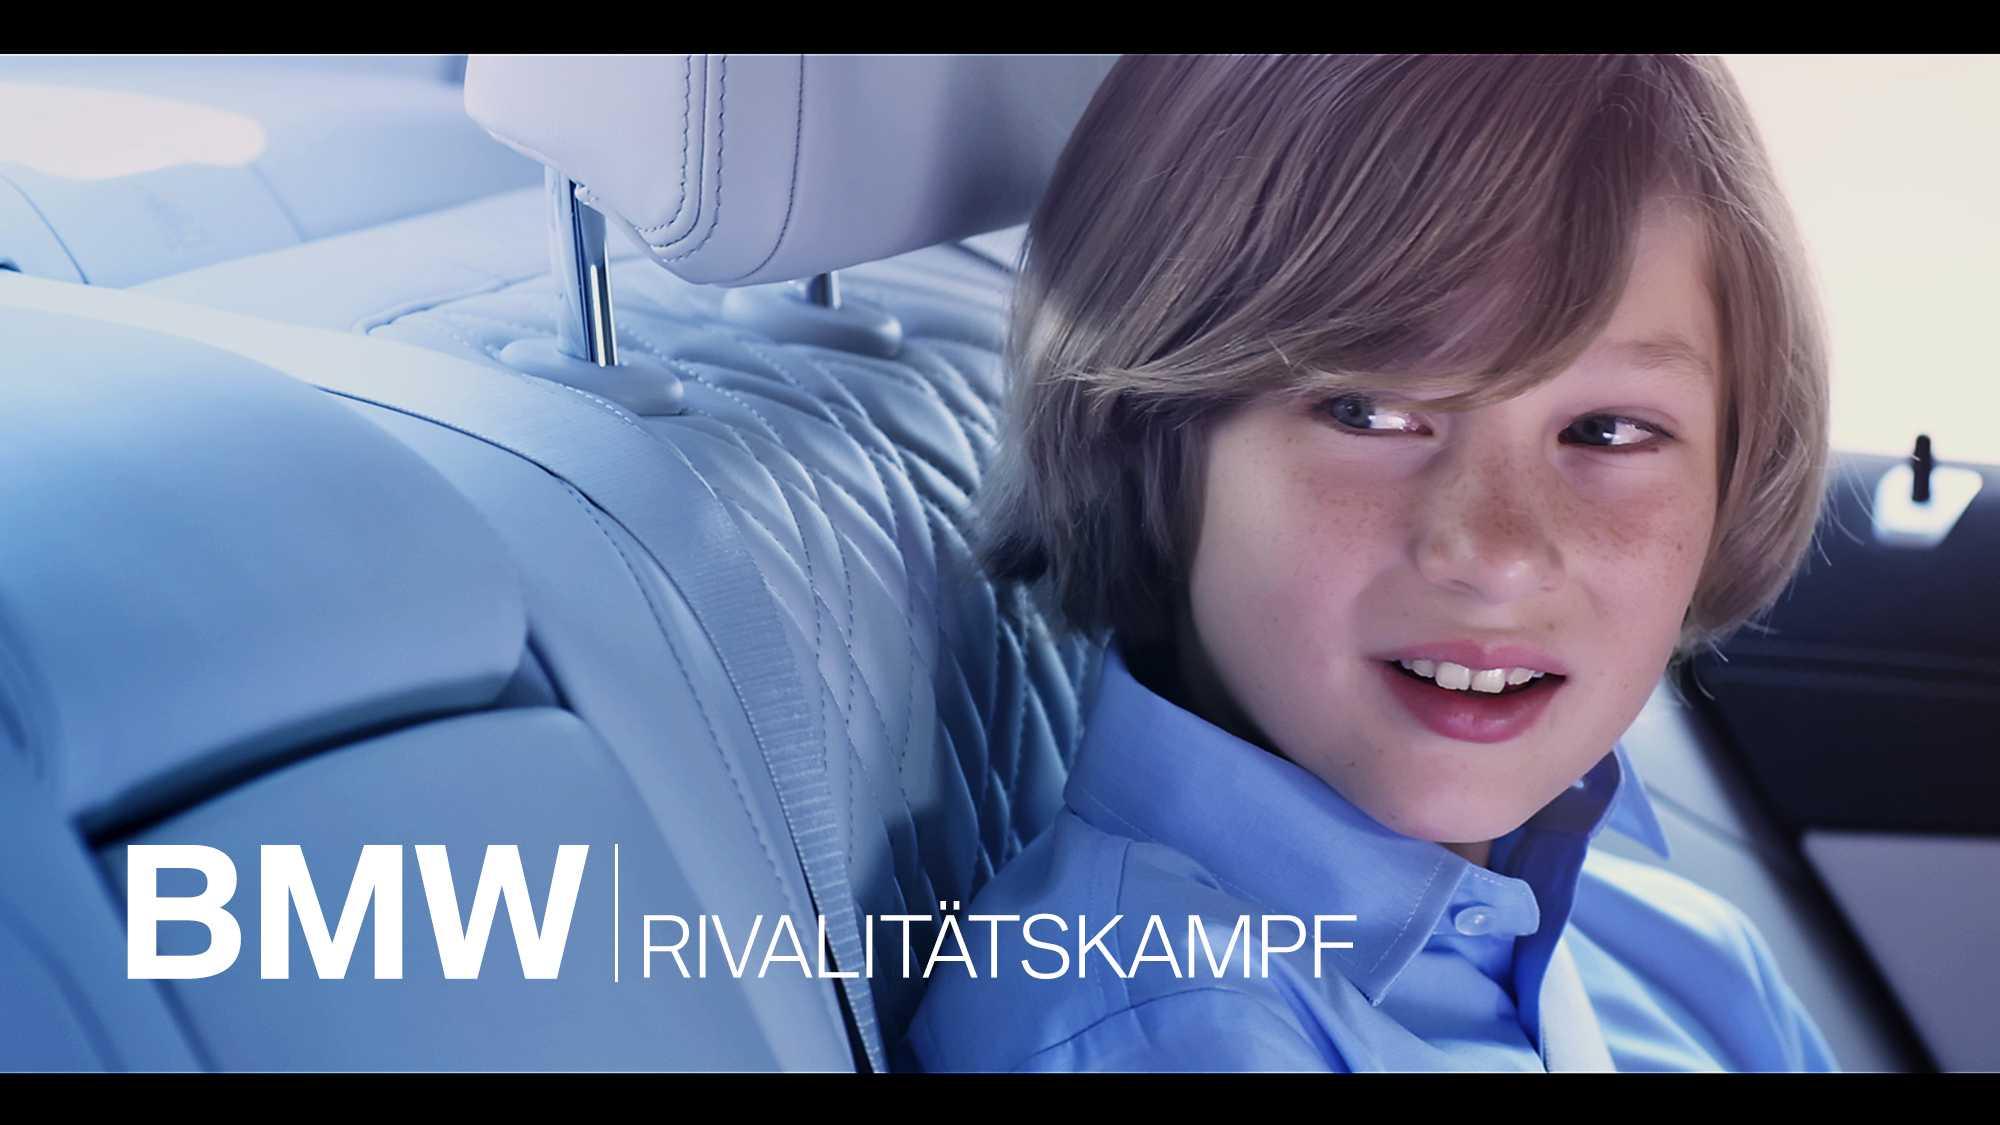 BMW Connected Drive Rivalitätskampf